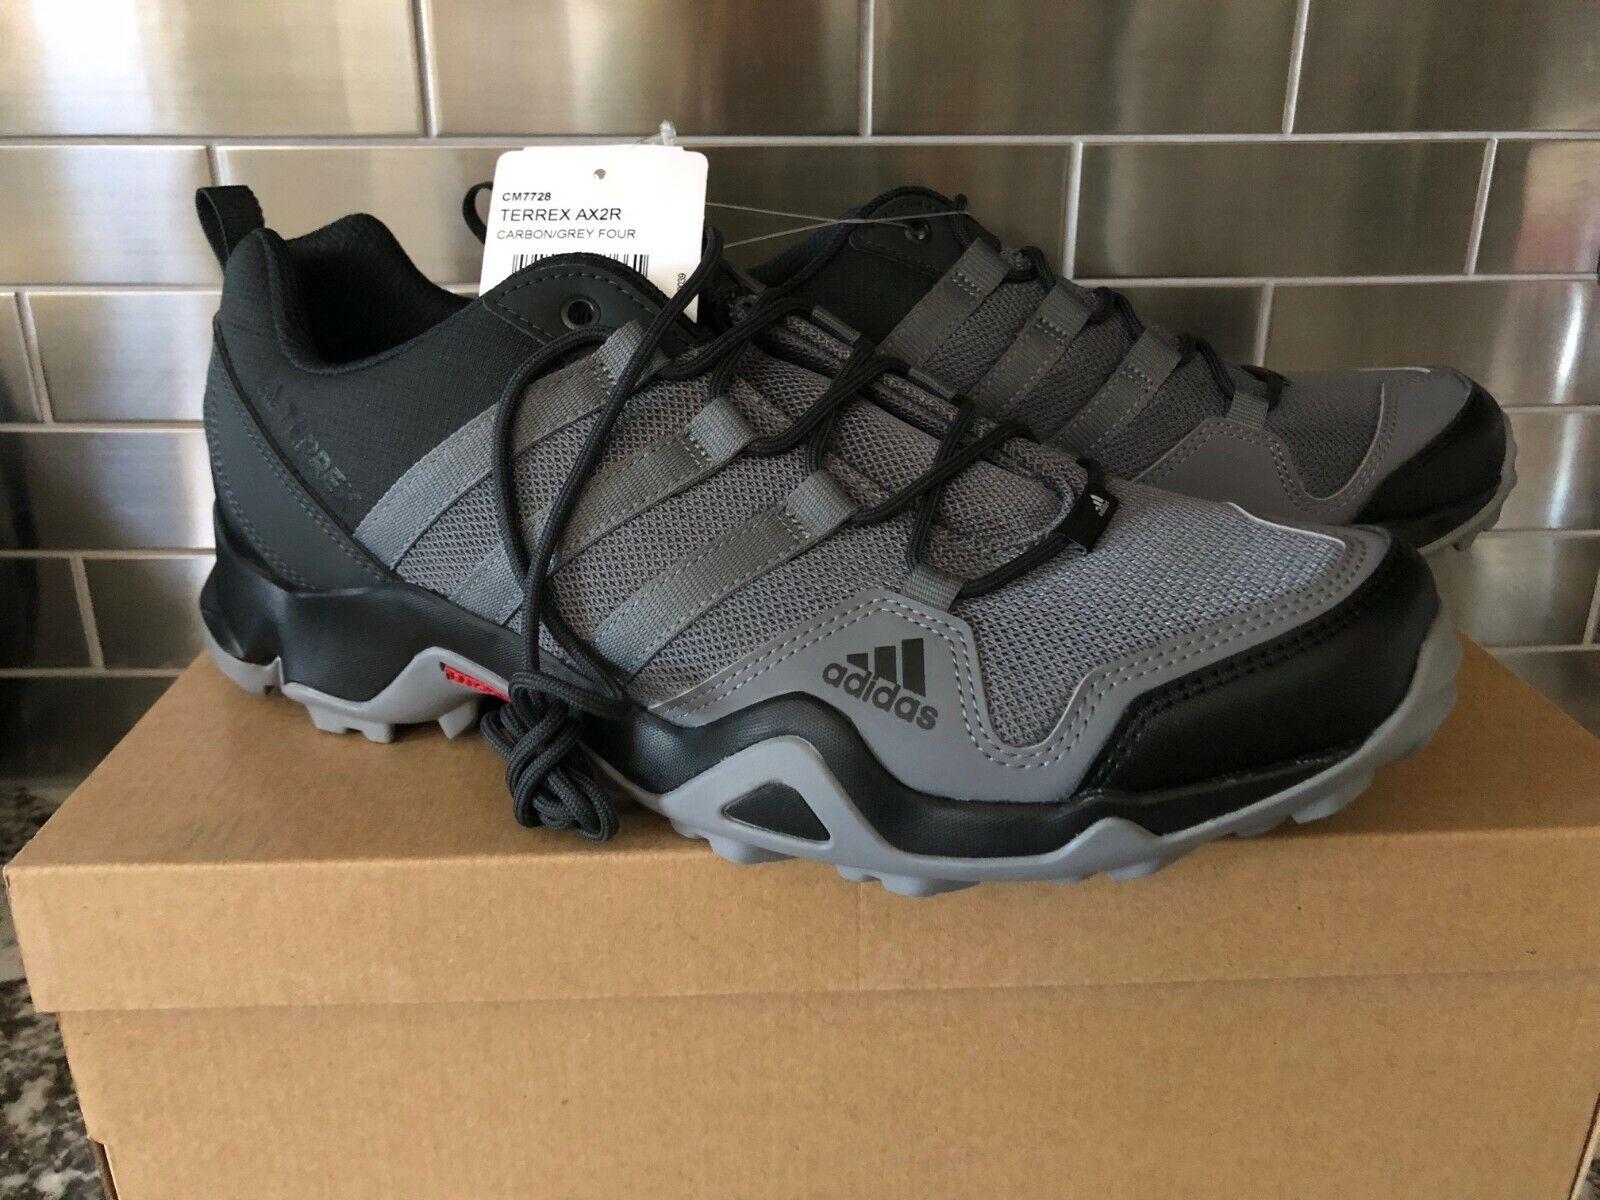 una taza de Deambular hogar  adidas Men's Outdoor Terrex Swift R GTX Hiking Shoes Branch/black/umber  Size 13 for sale online | eBay